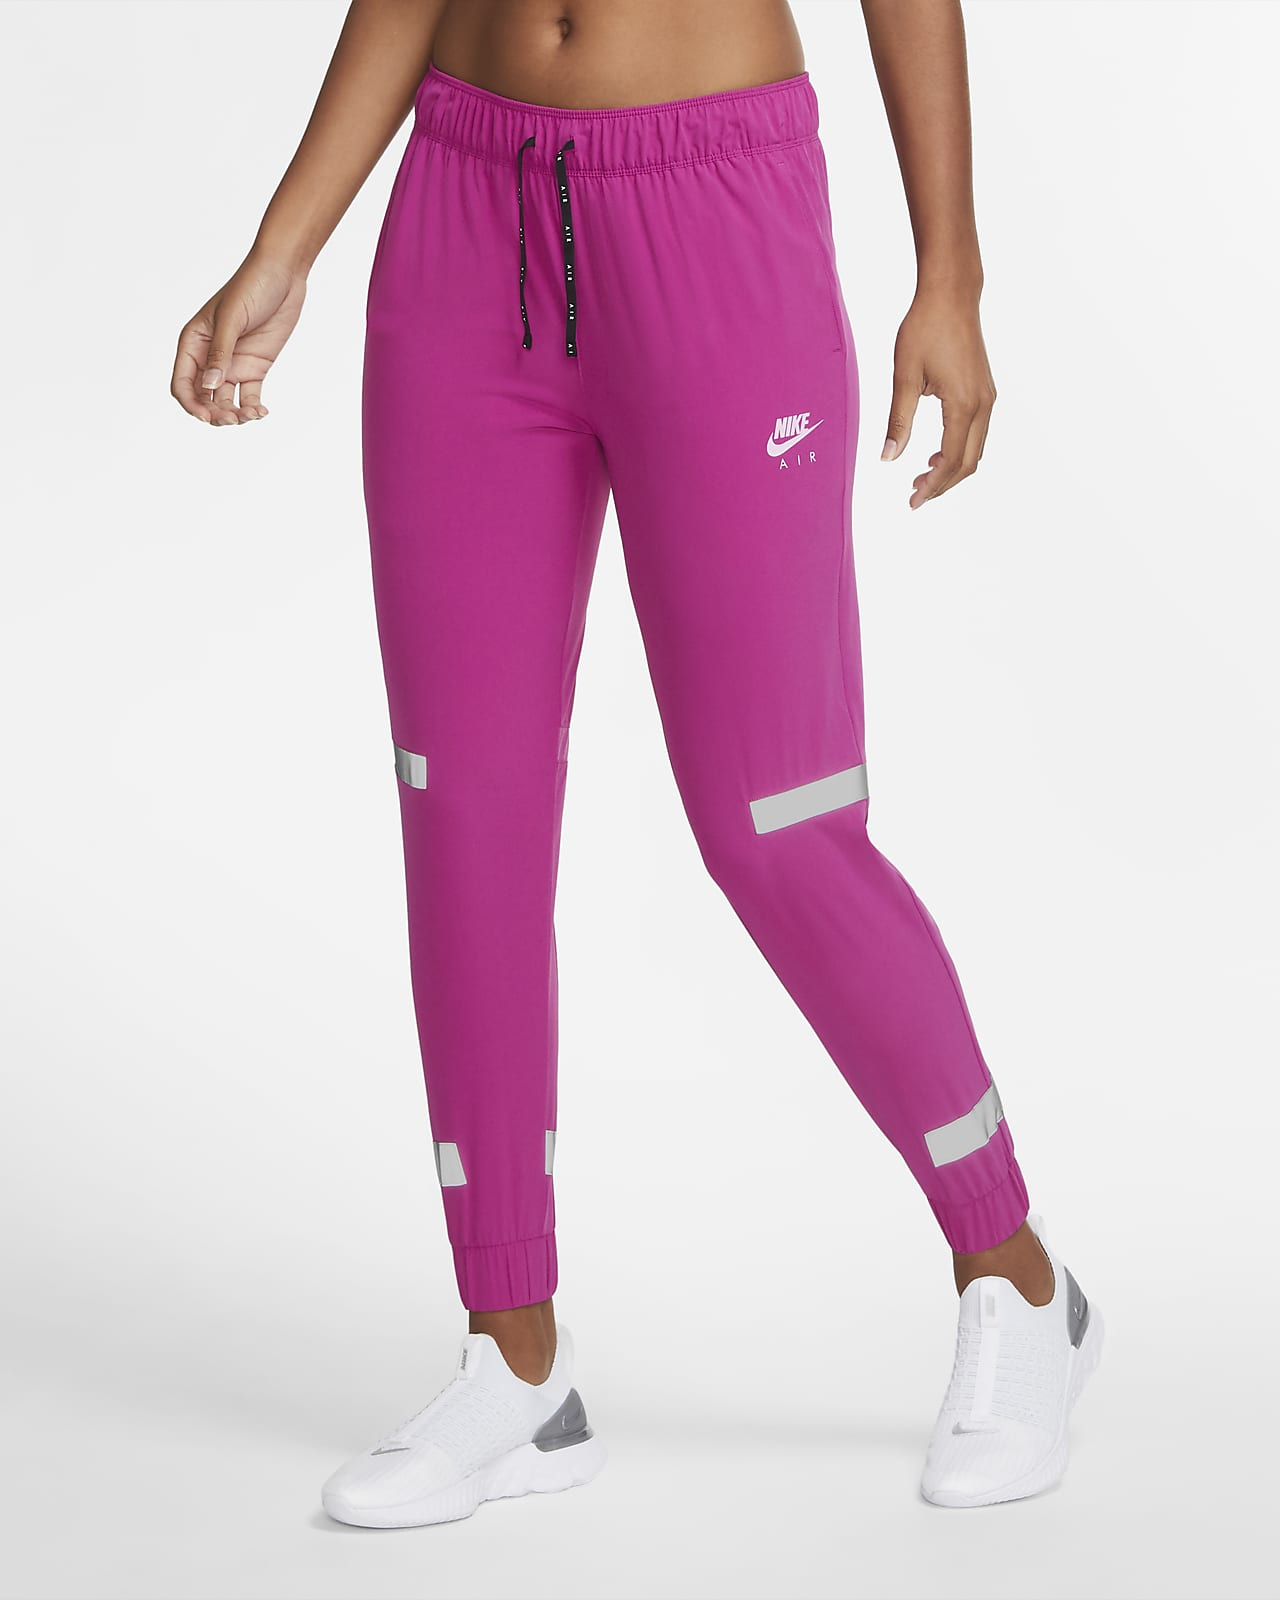 Nike Air Women's Running Trousers